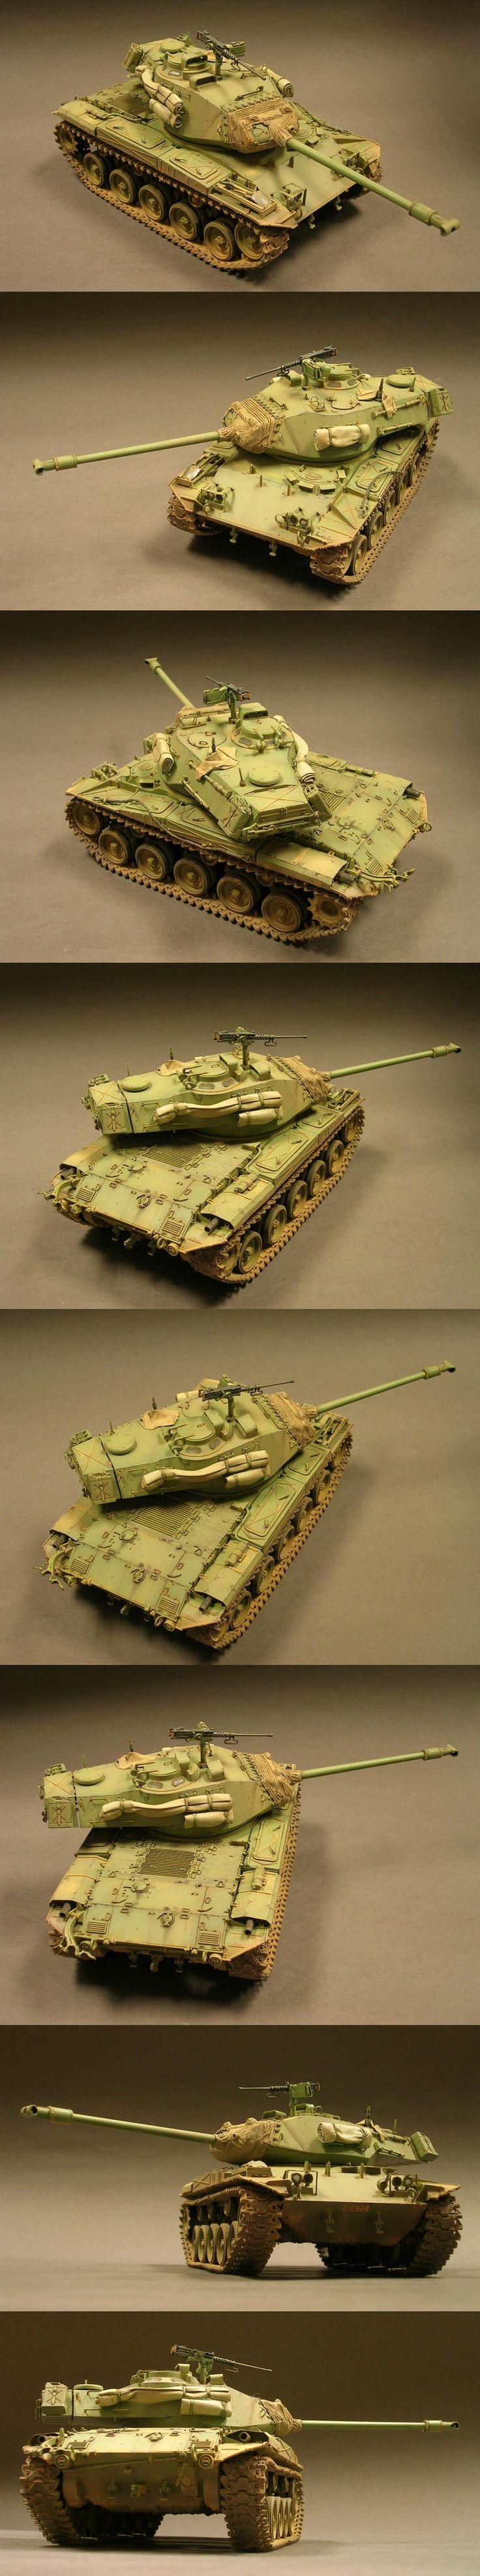 M41A3 Walker Bulldog 1/35 Scale Model